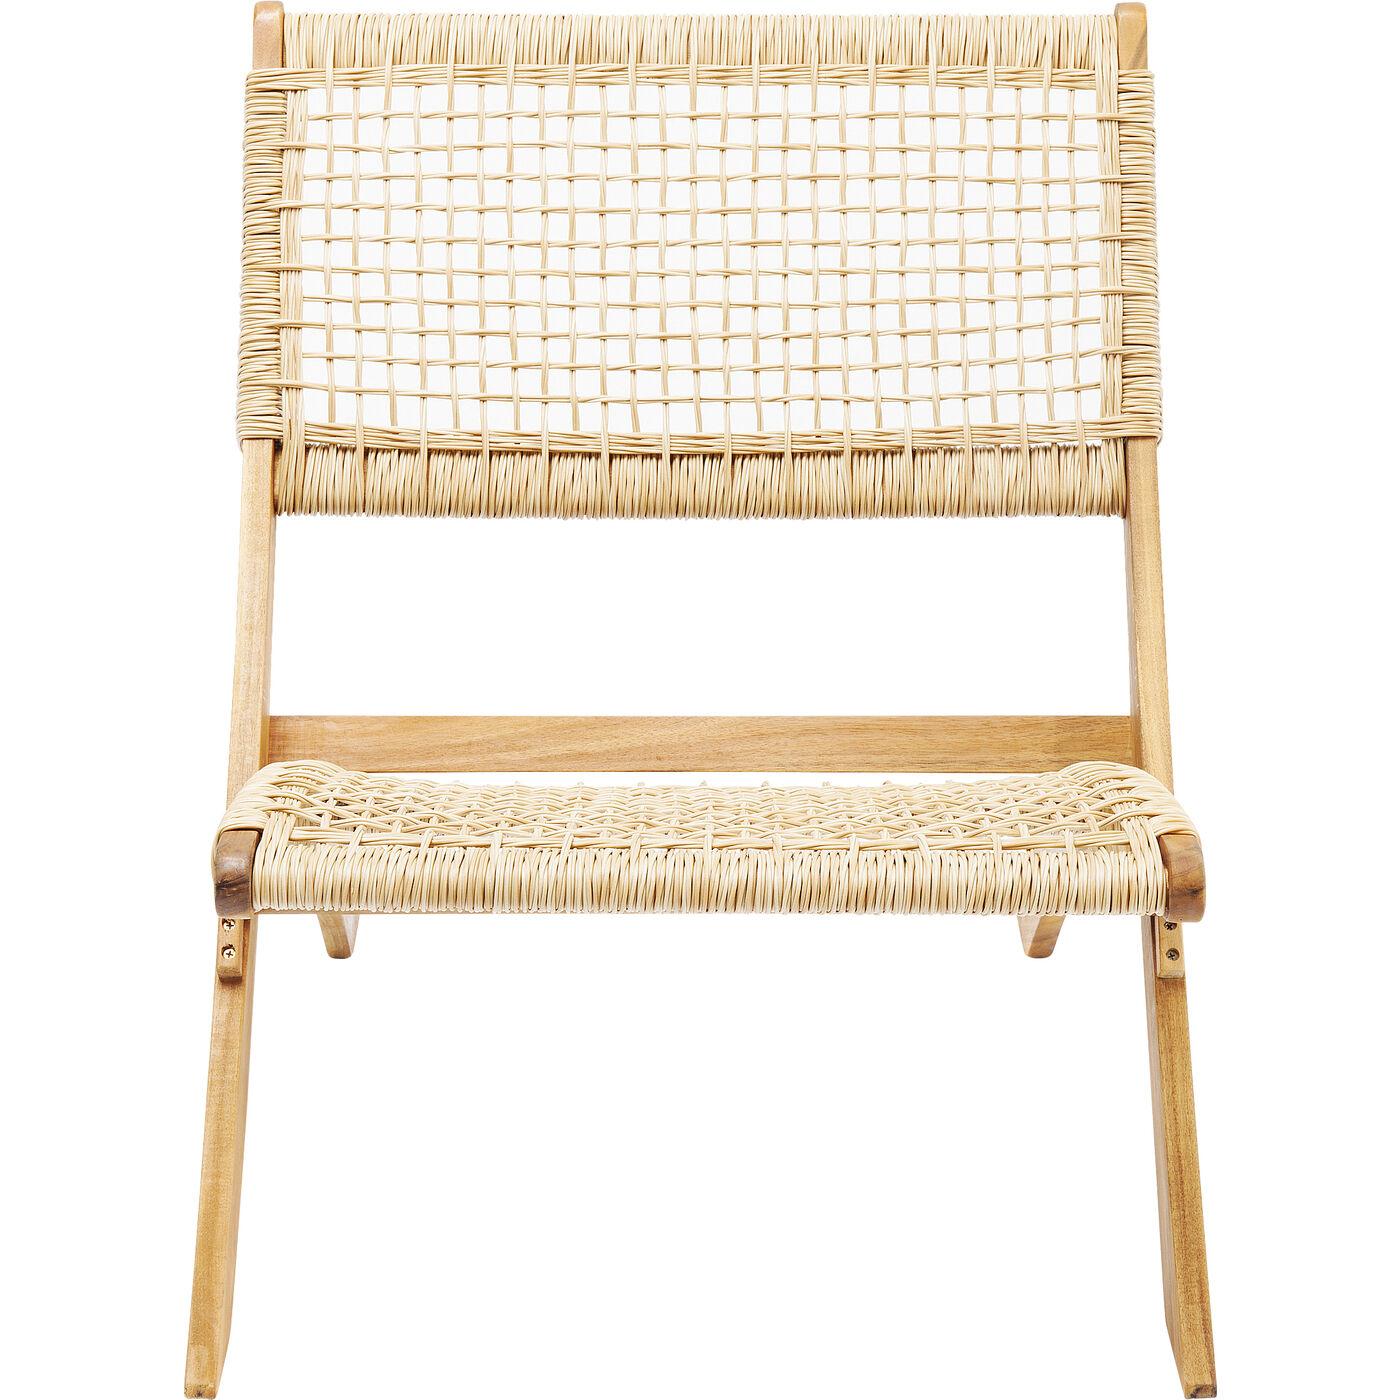 "*NEU*: Gartenstuhl ""Copacabana"" aus Akazienholz, beige"